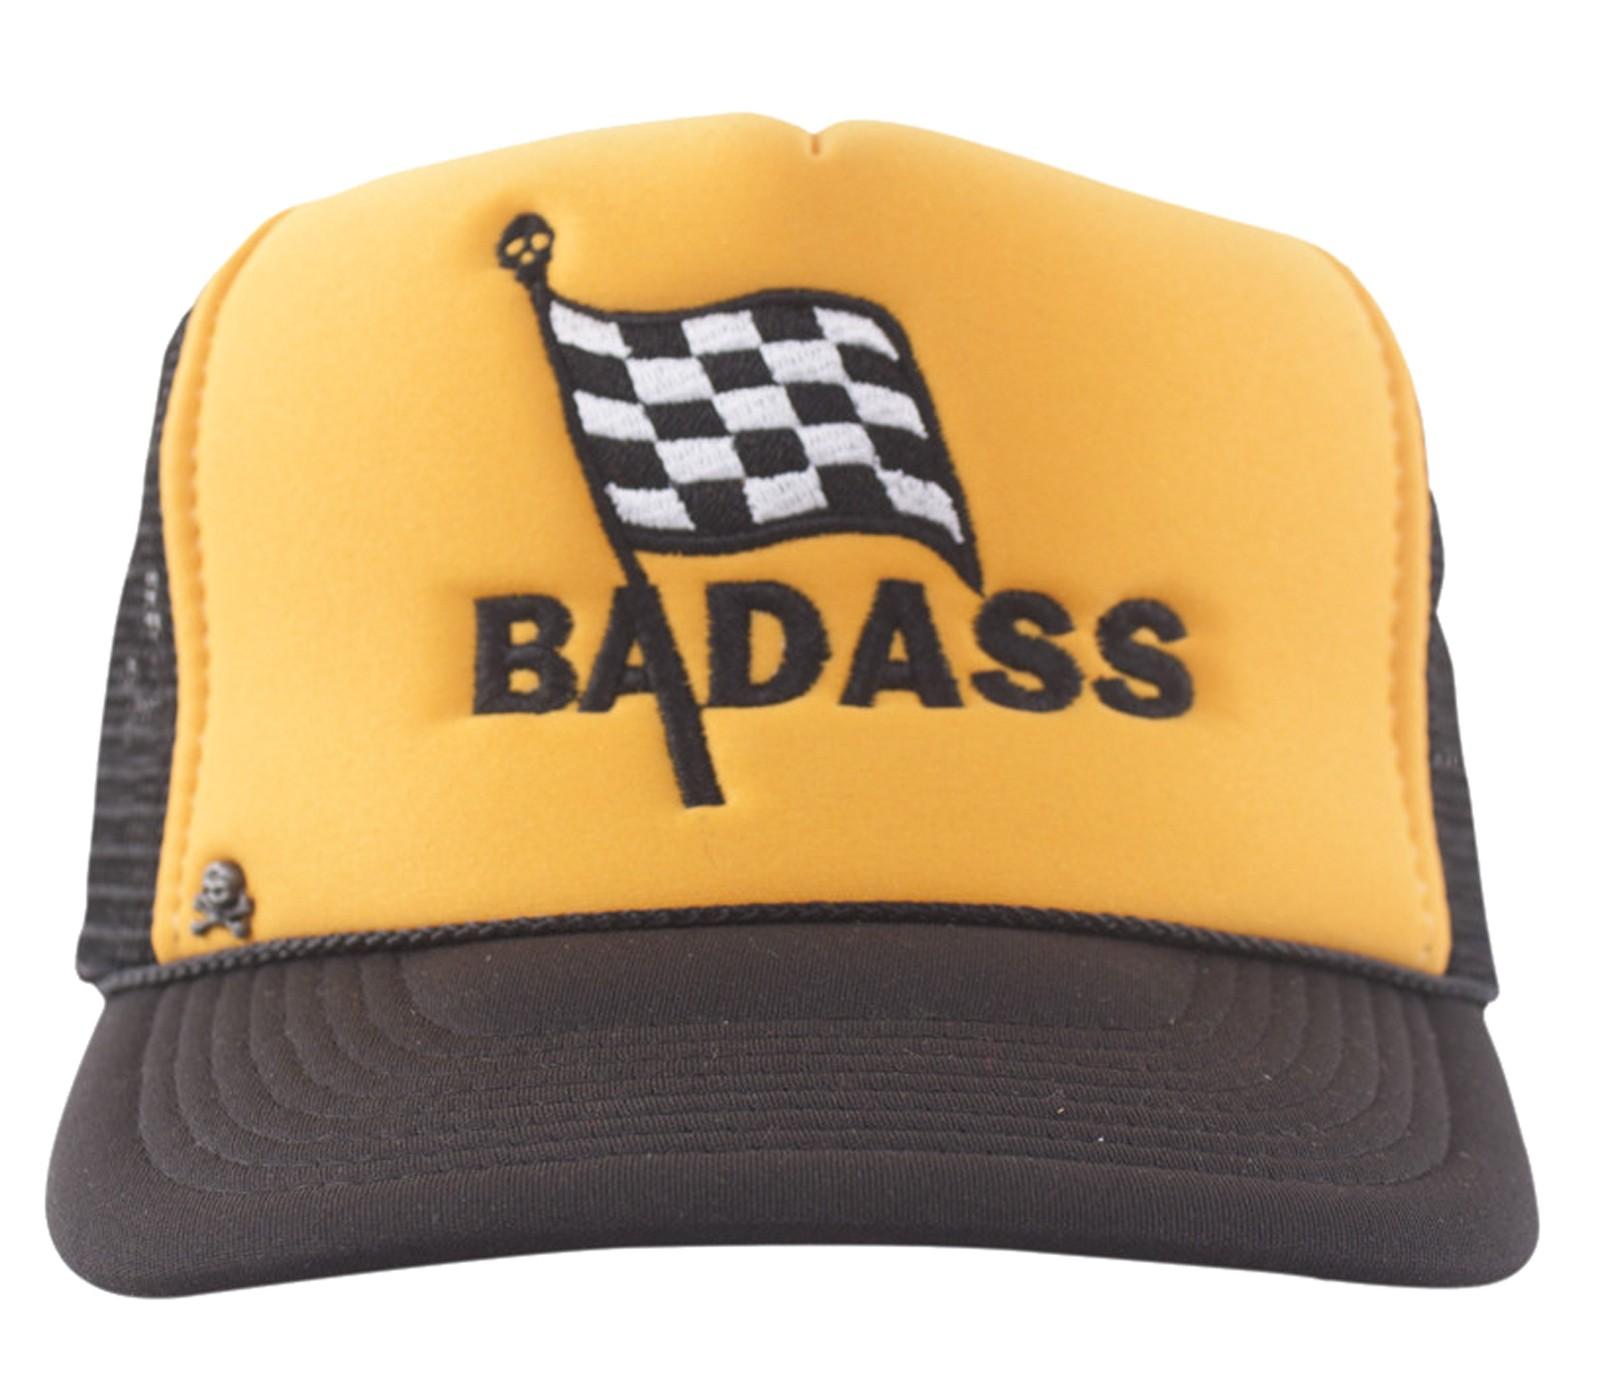 La Marca Del Diablo - Badass Trucker Cap